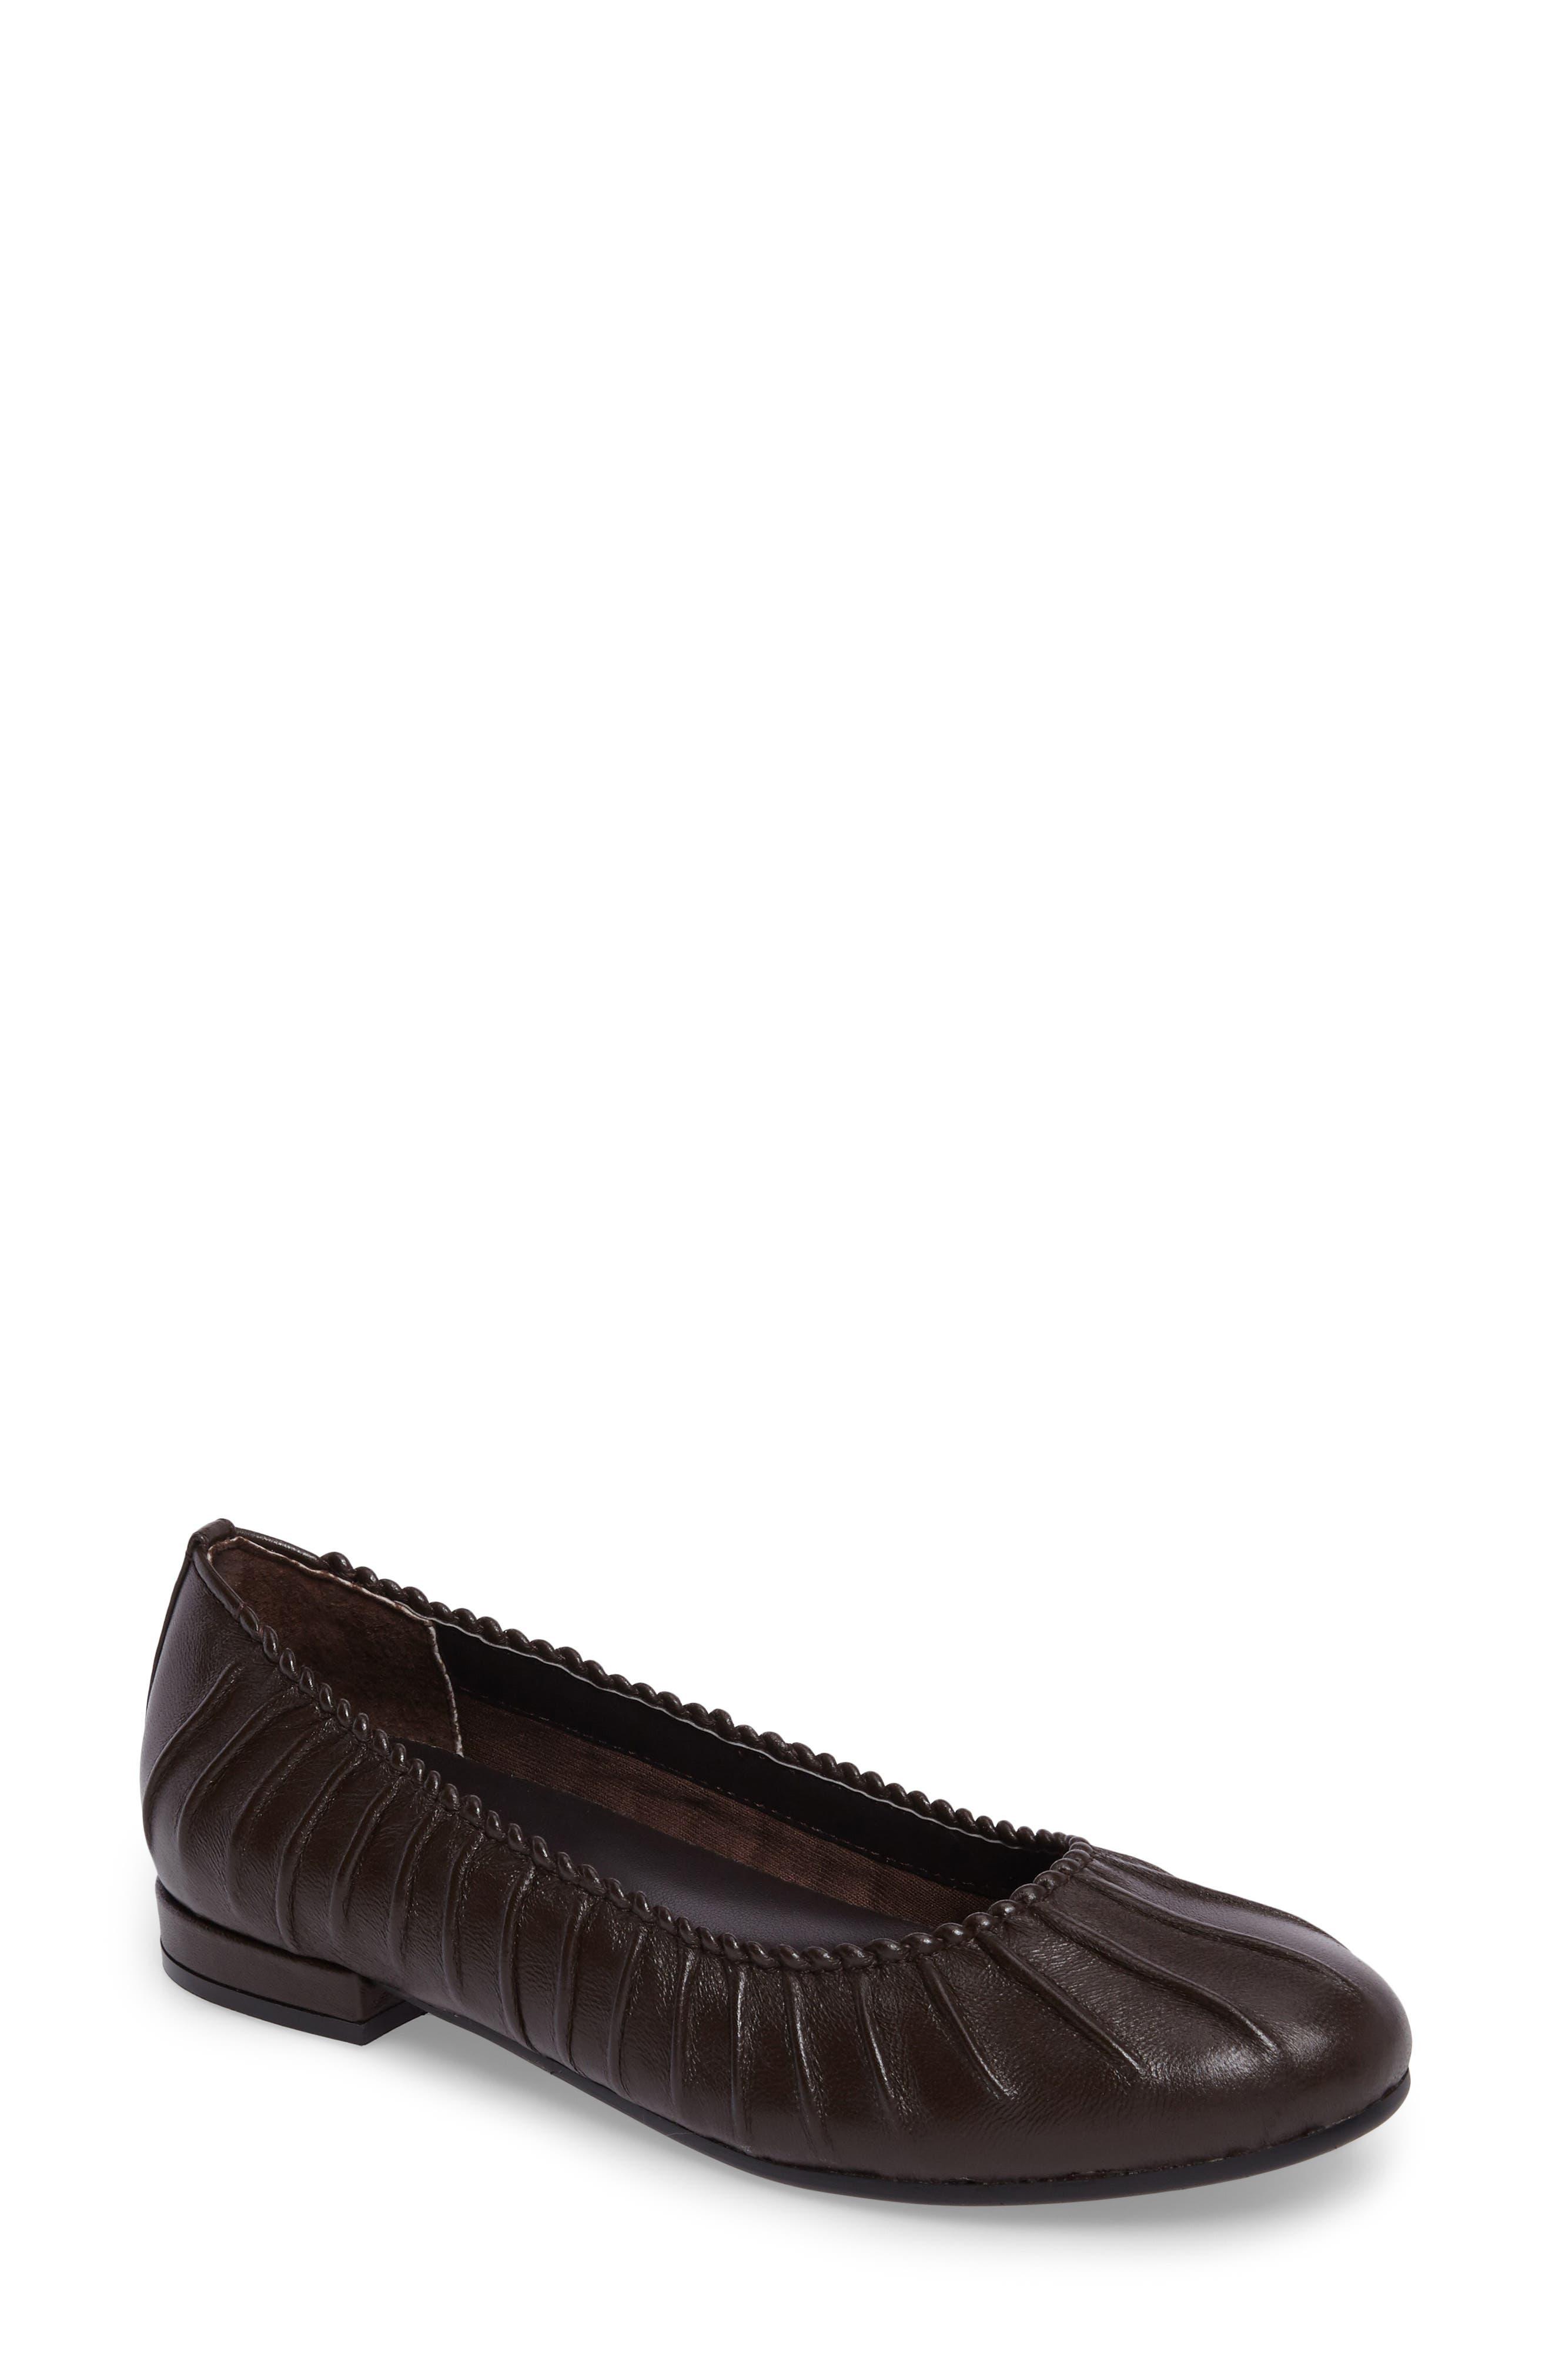 Santo Flat,                             Main thumbnail 1, color,                             Brown Leather